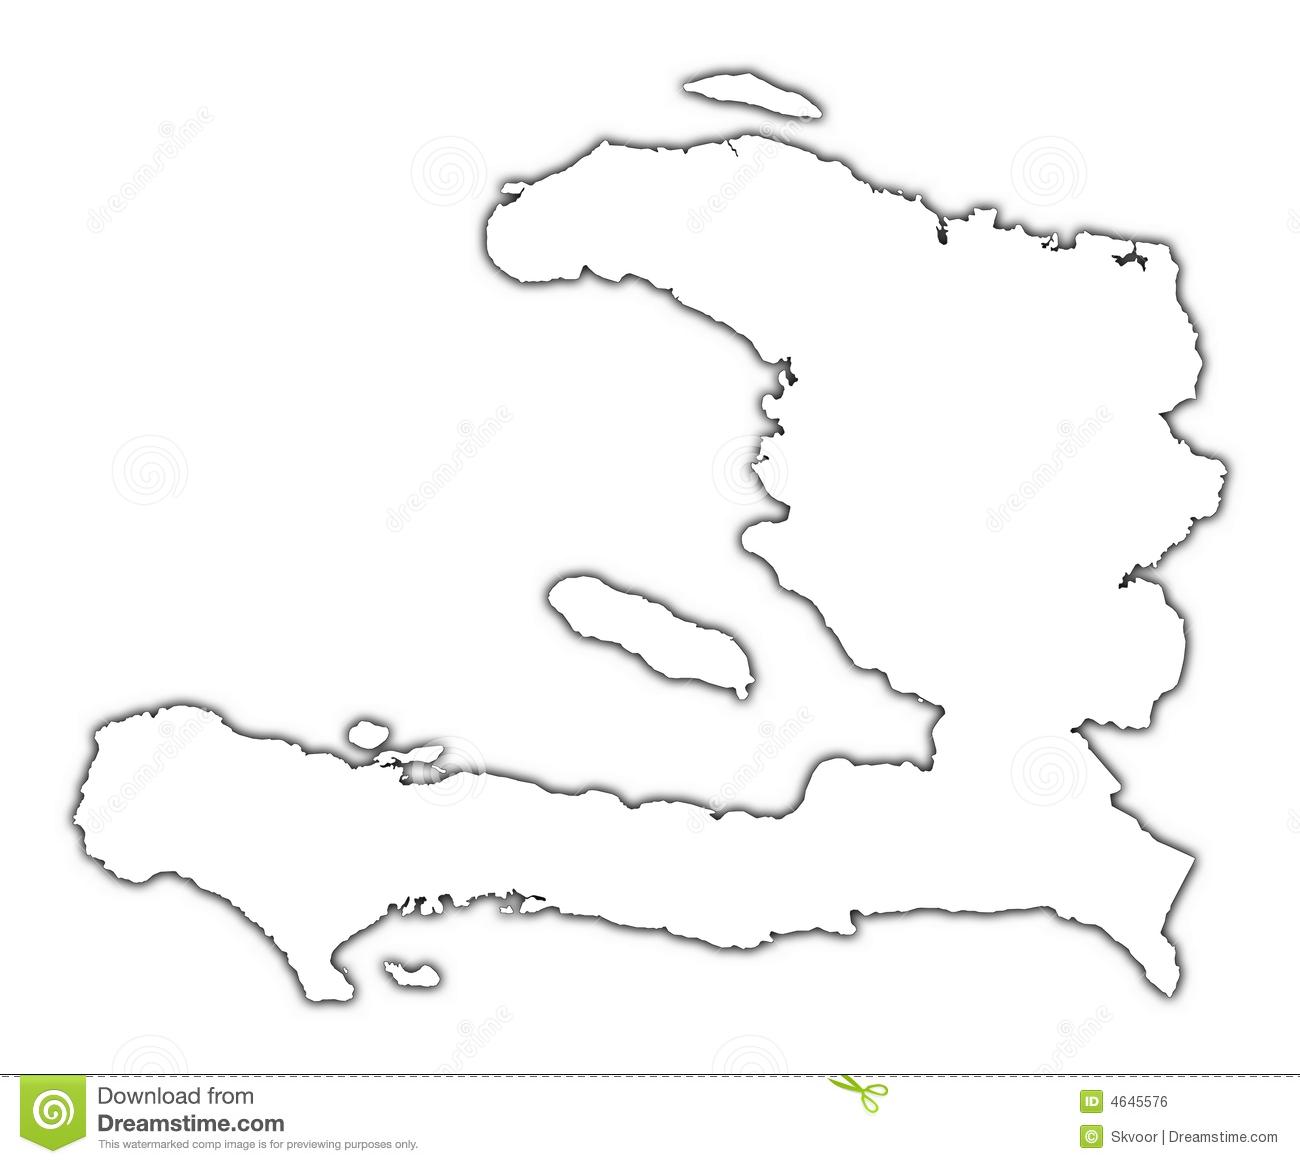 Map of haiti clipart.